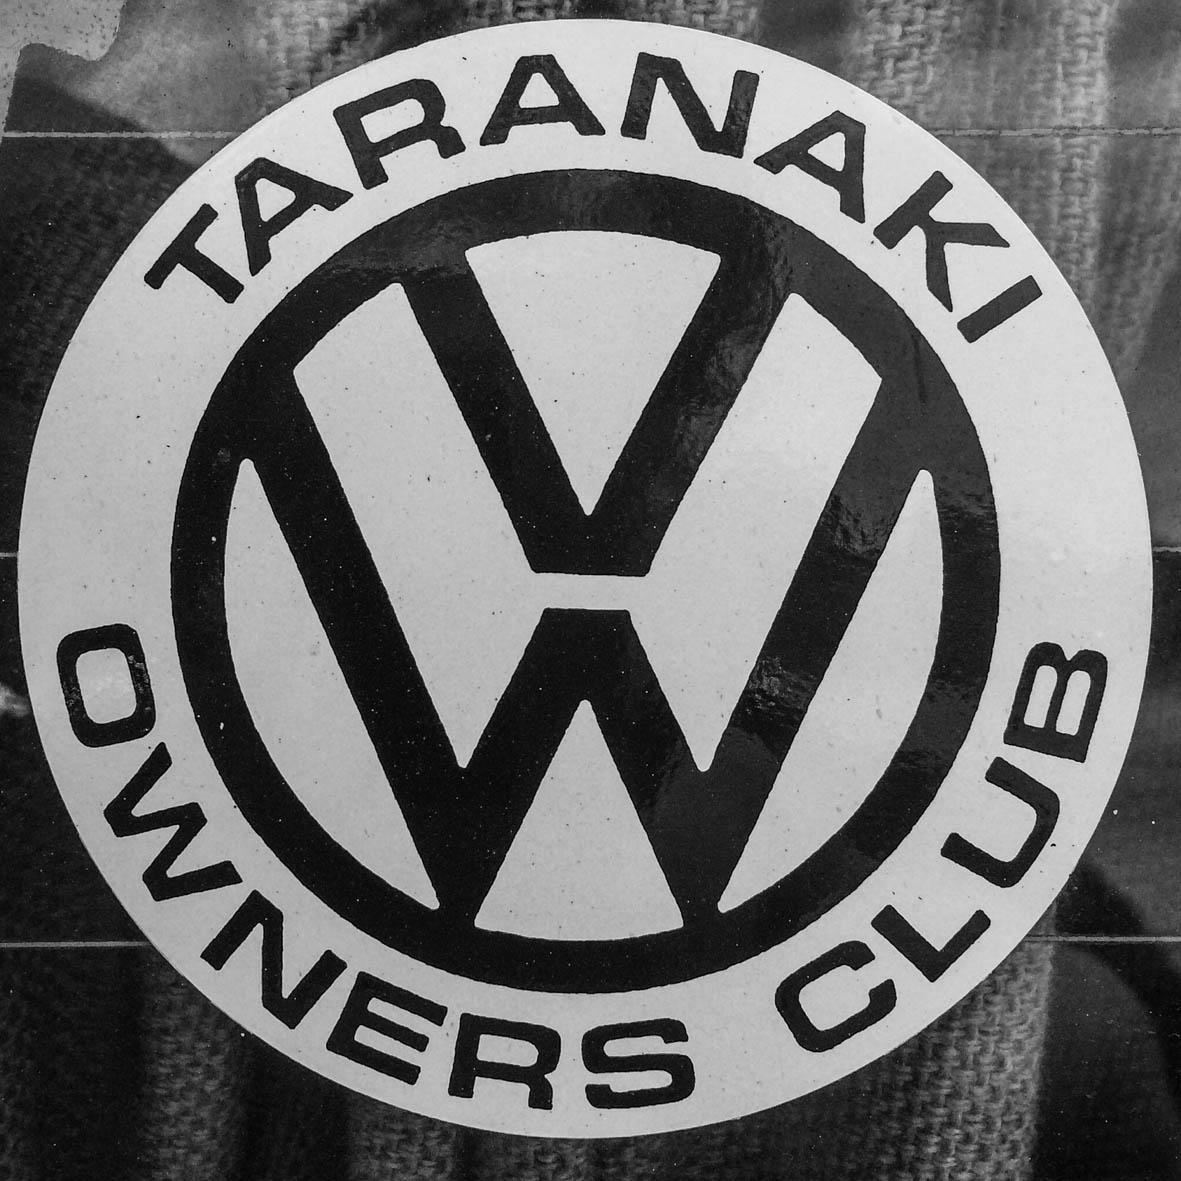 Let's get a WV Taranaki VW owners unite!